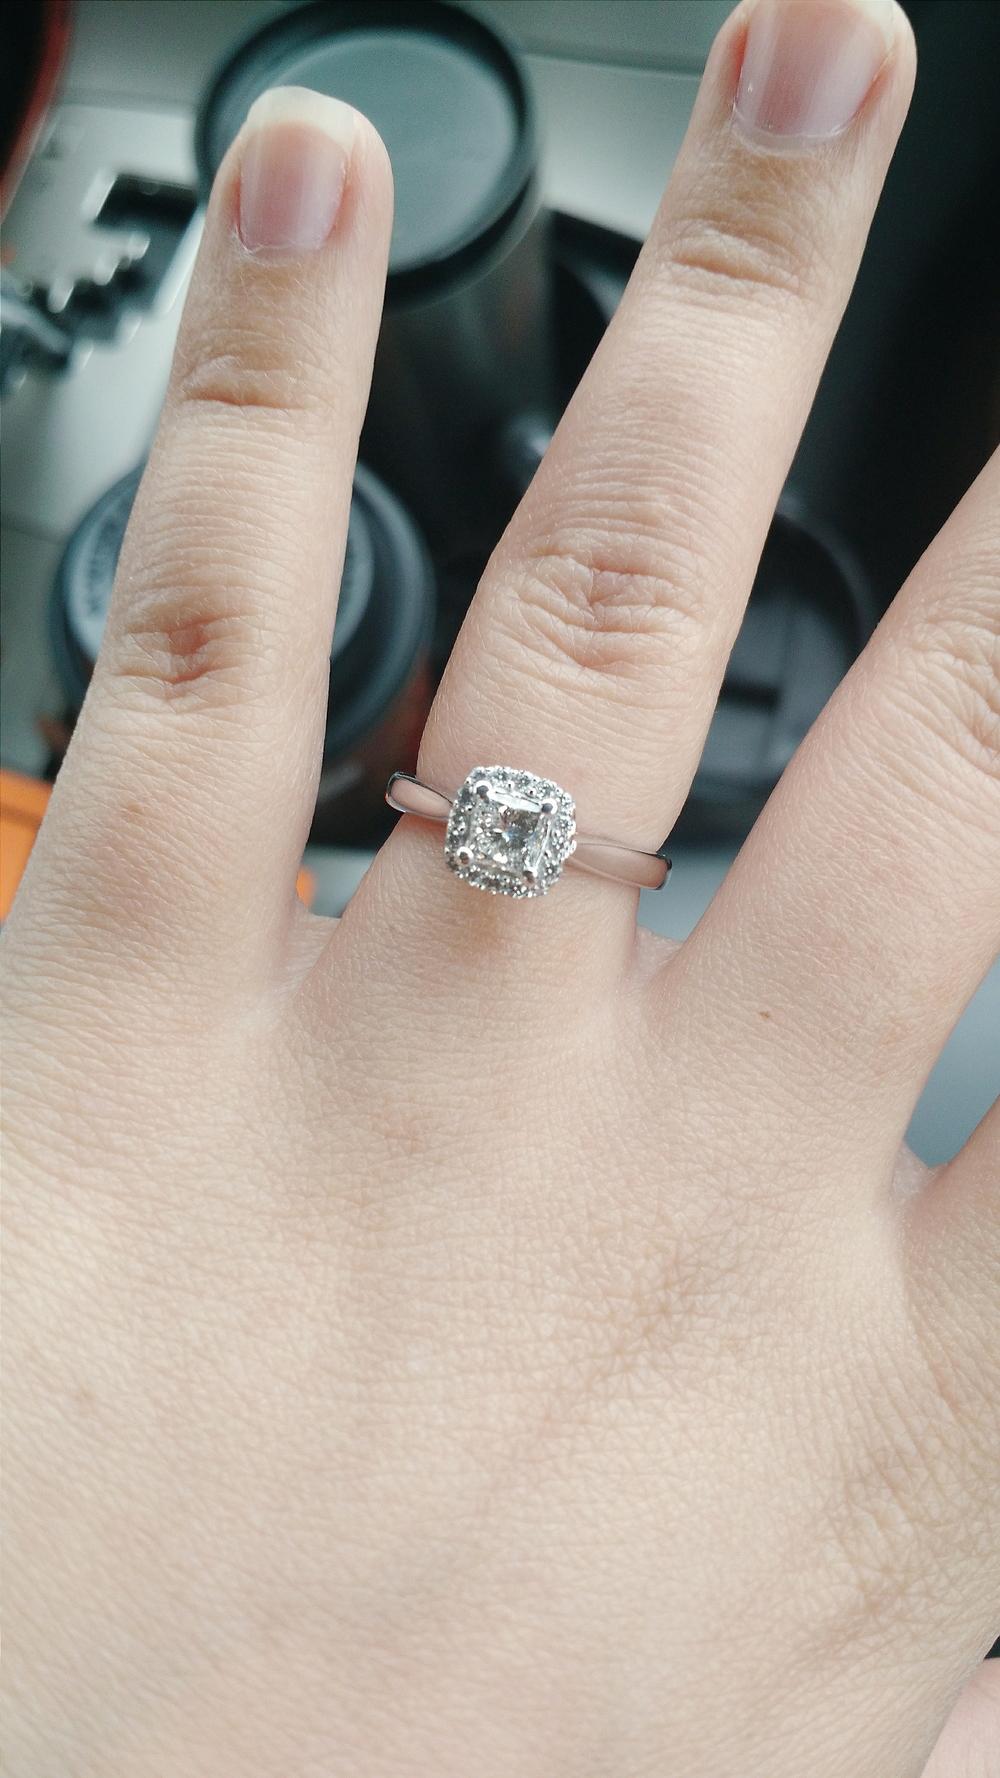 my ring got dipped - so shiny!